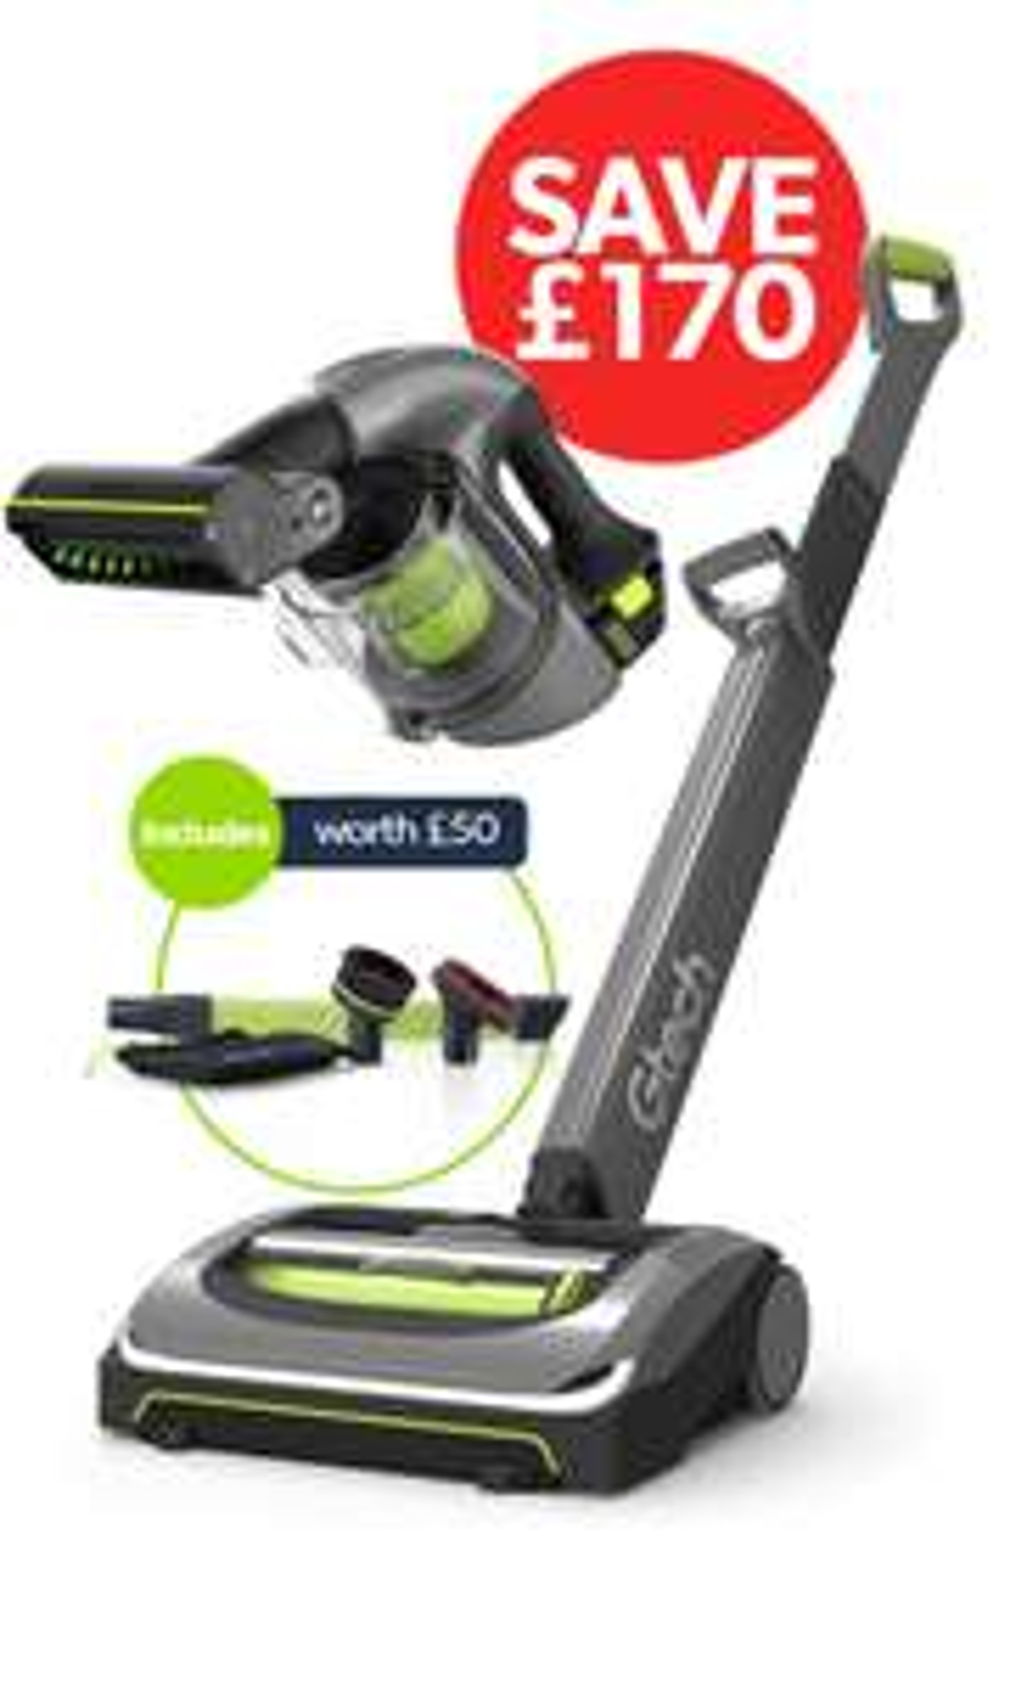 Gtech AirRam Cordless Vacuum with car accessory kit - £229.98 @ Gtech Store